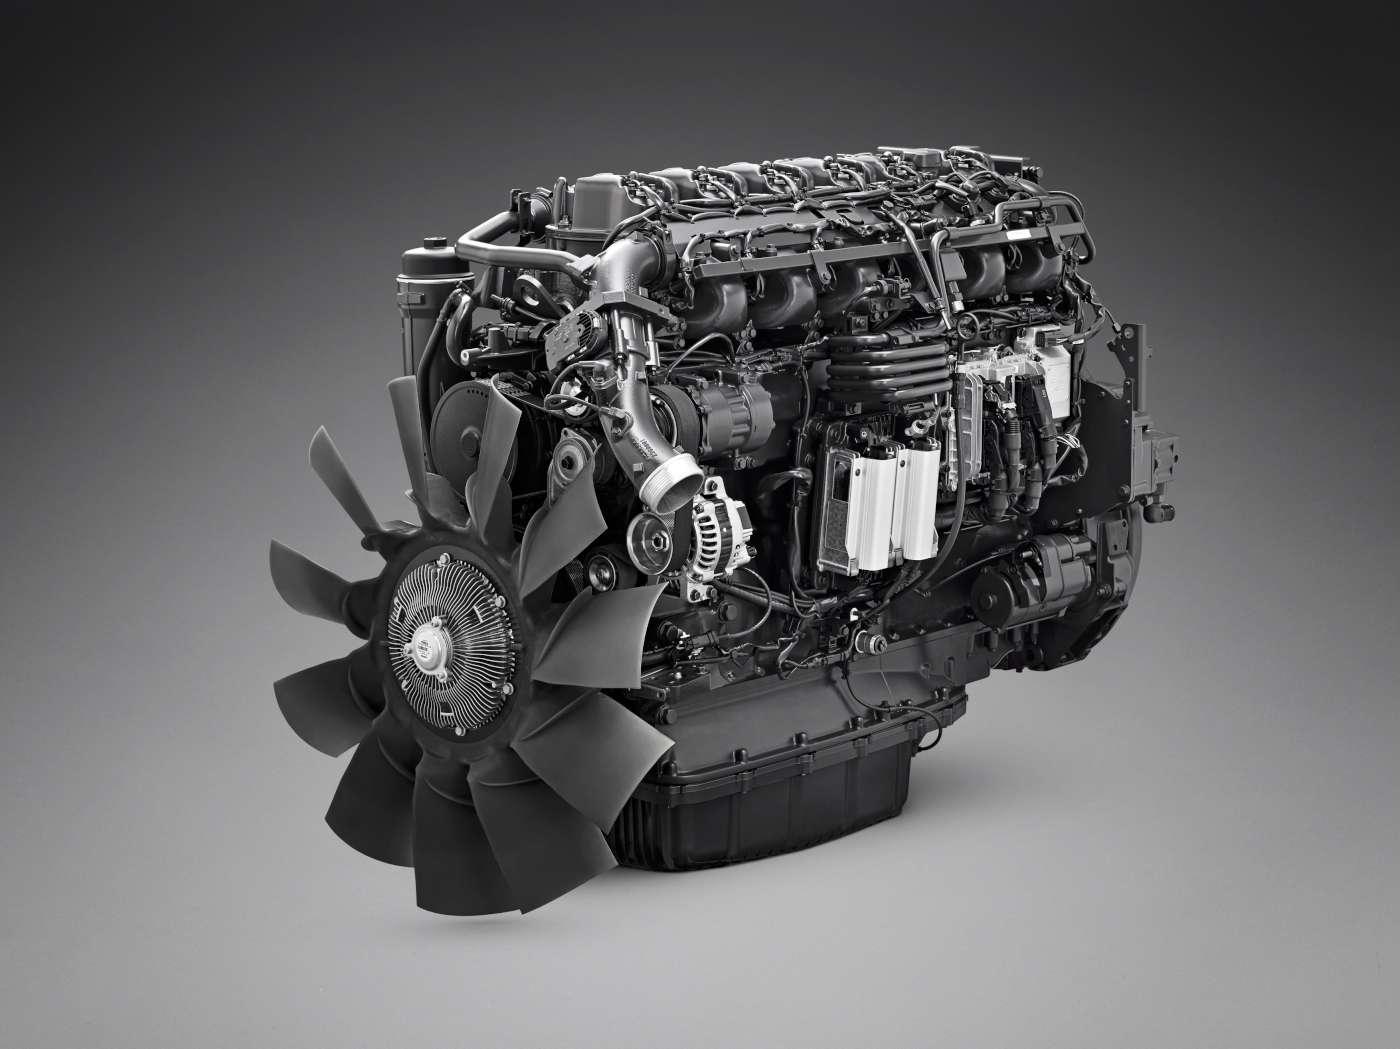 Scania Gas engine: 410 Hp – Iepieleaks